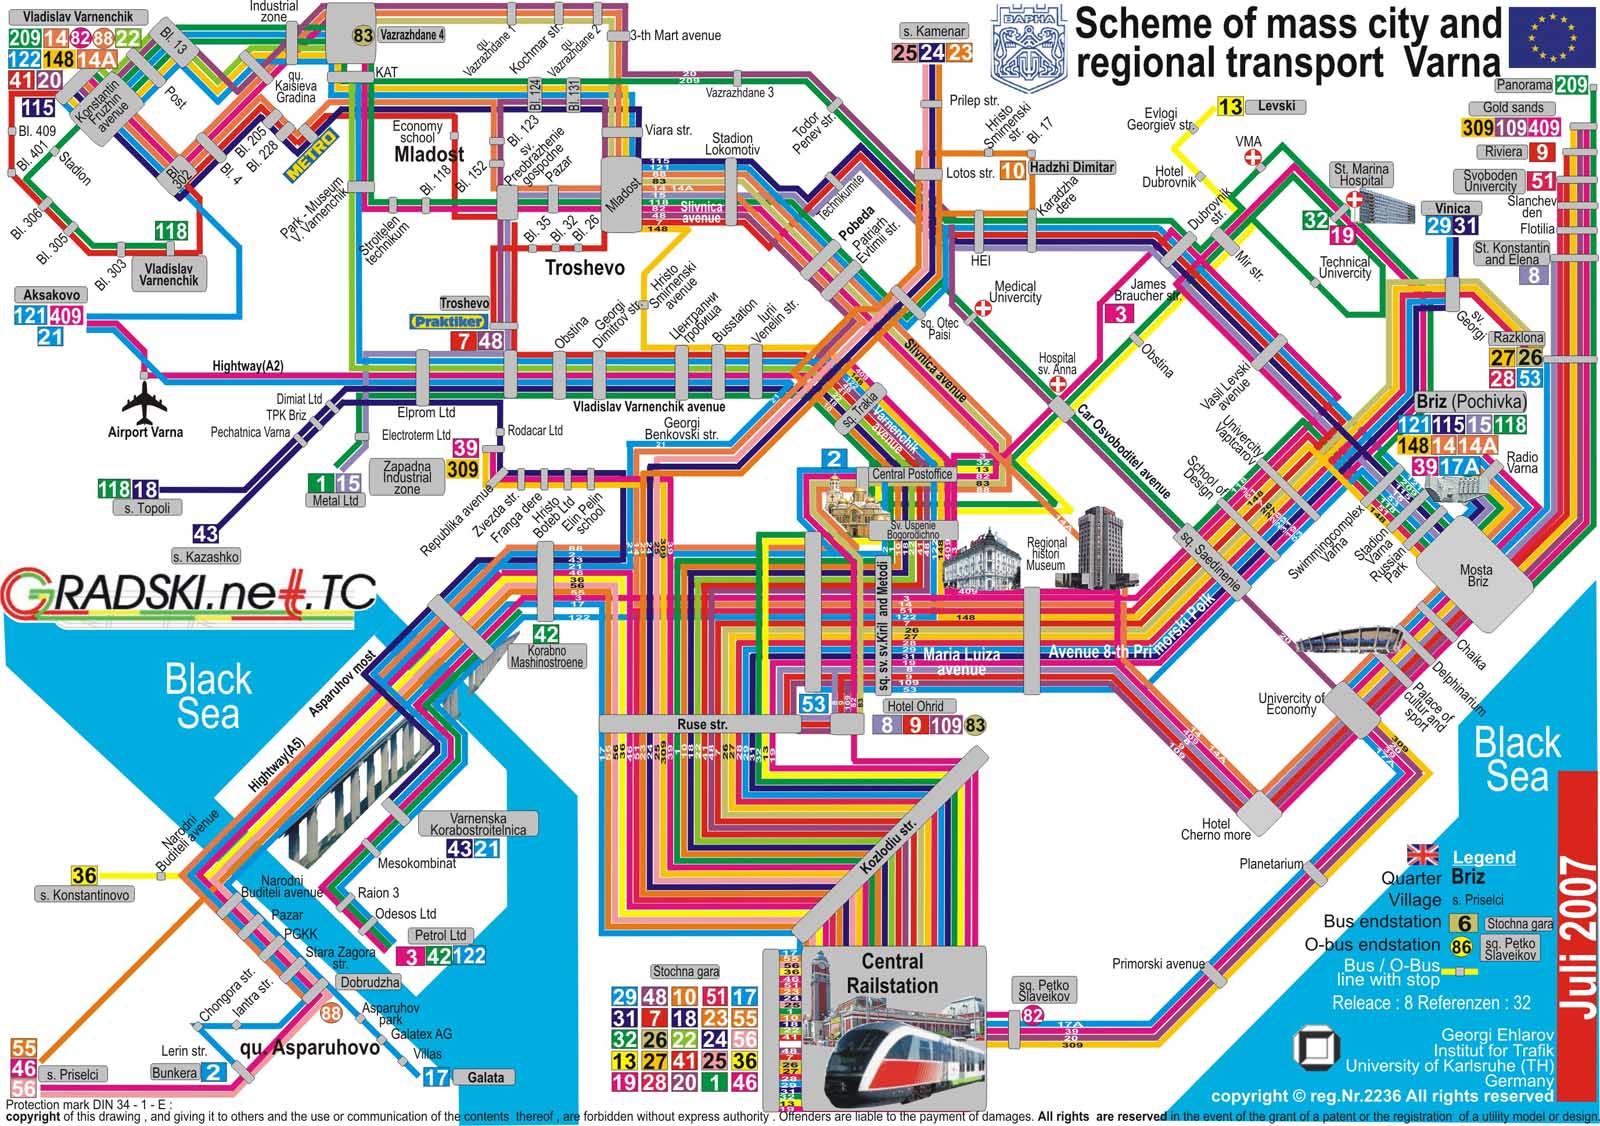 Karta 2019 Karta Na Varna S Avtobusni Linii